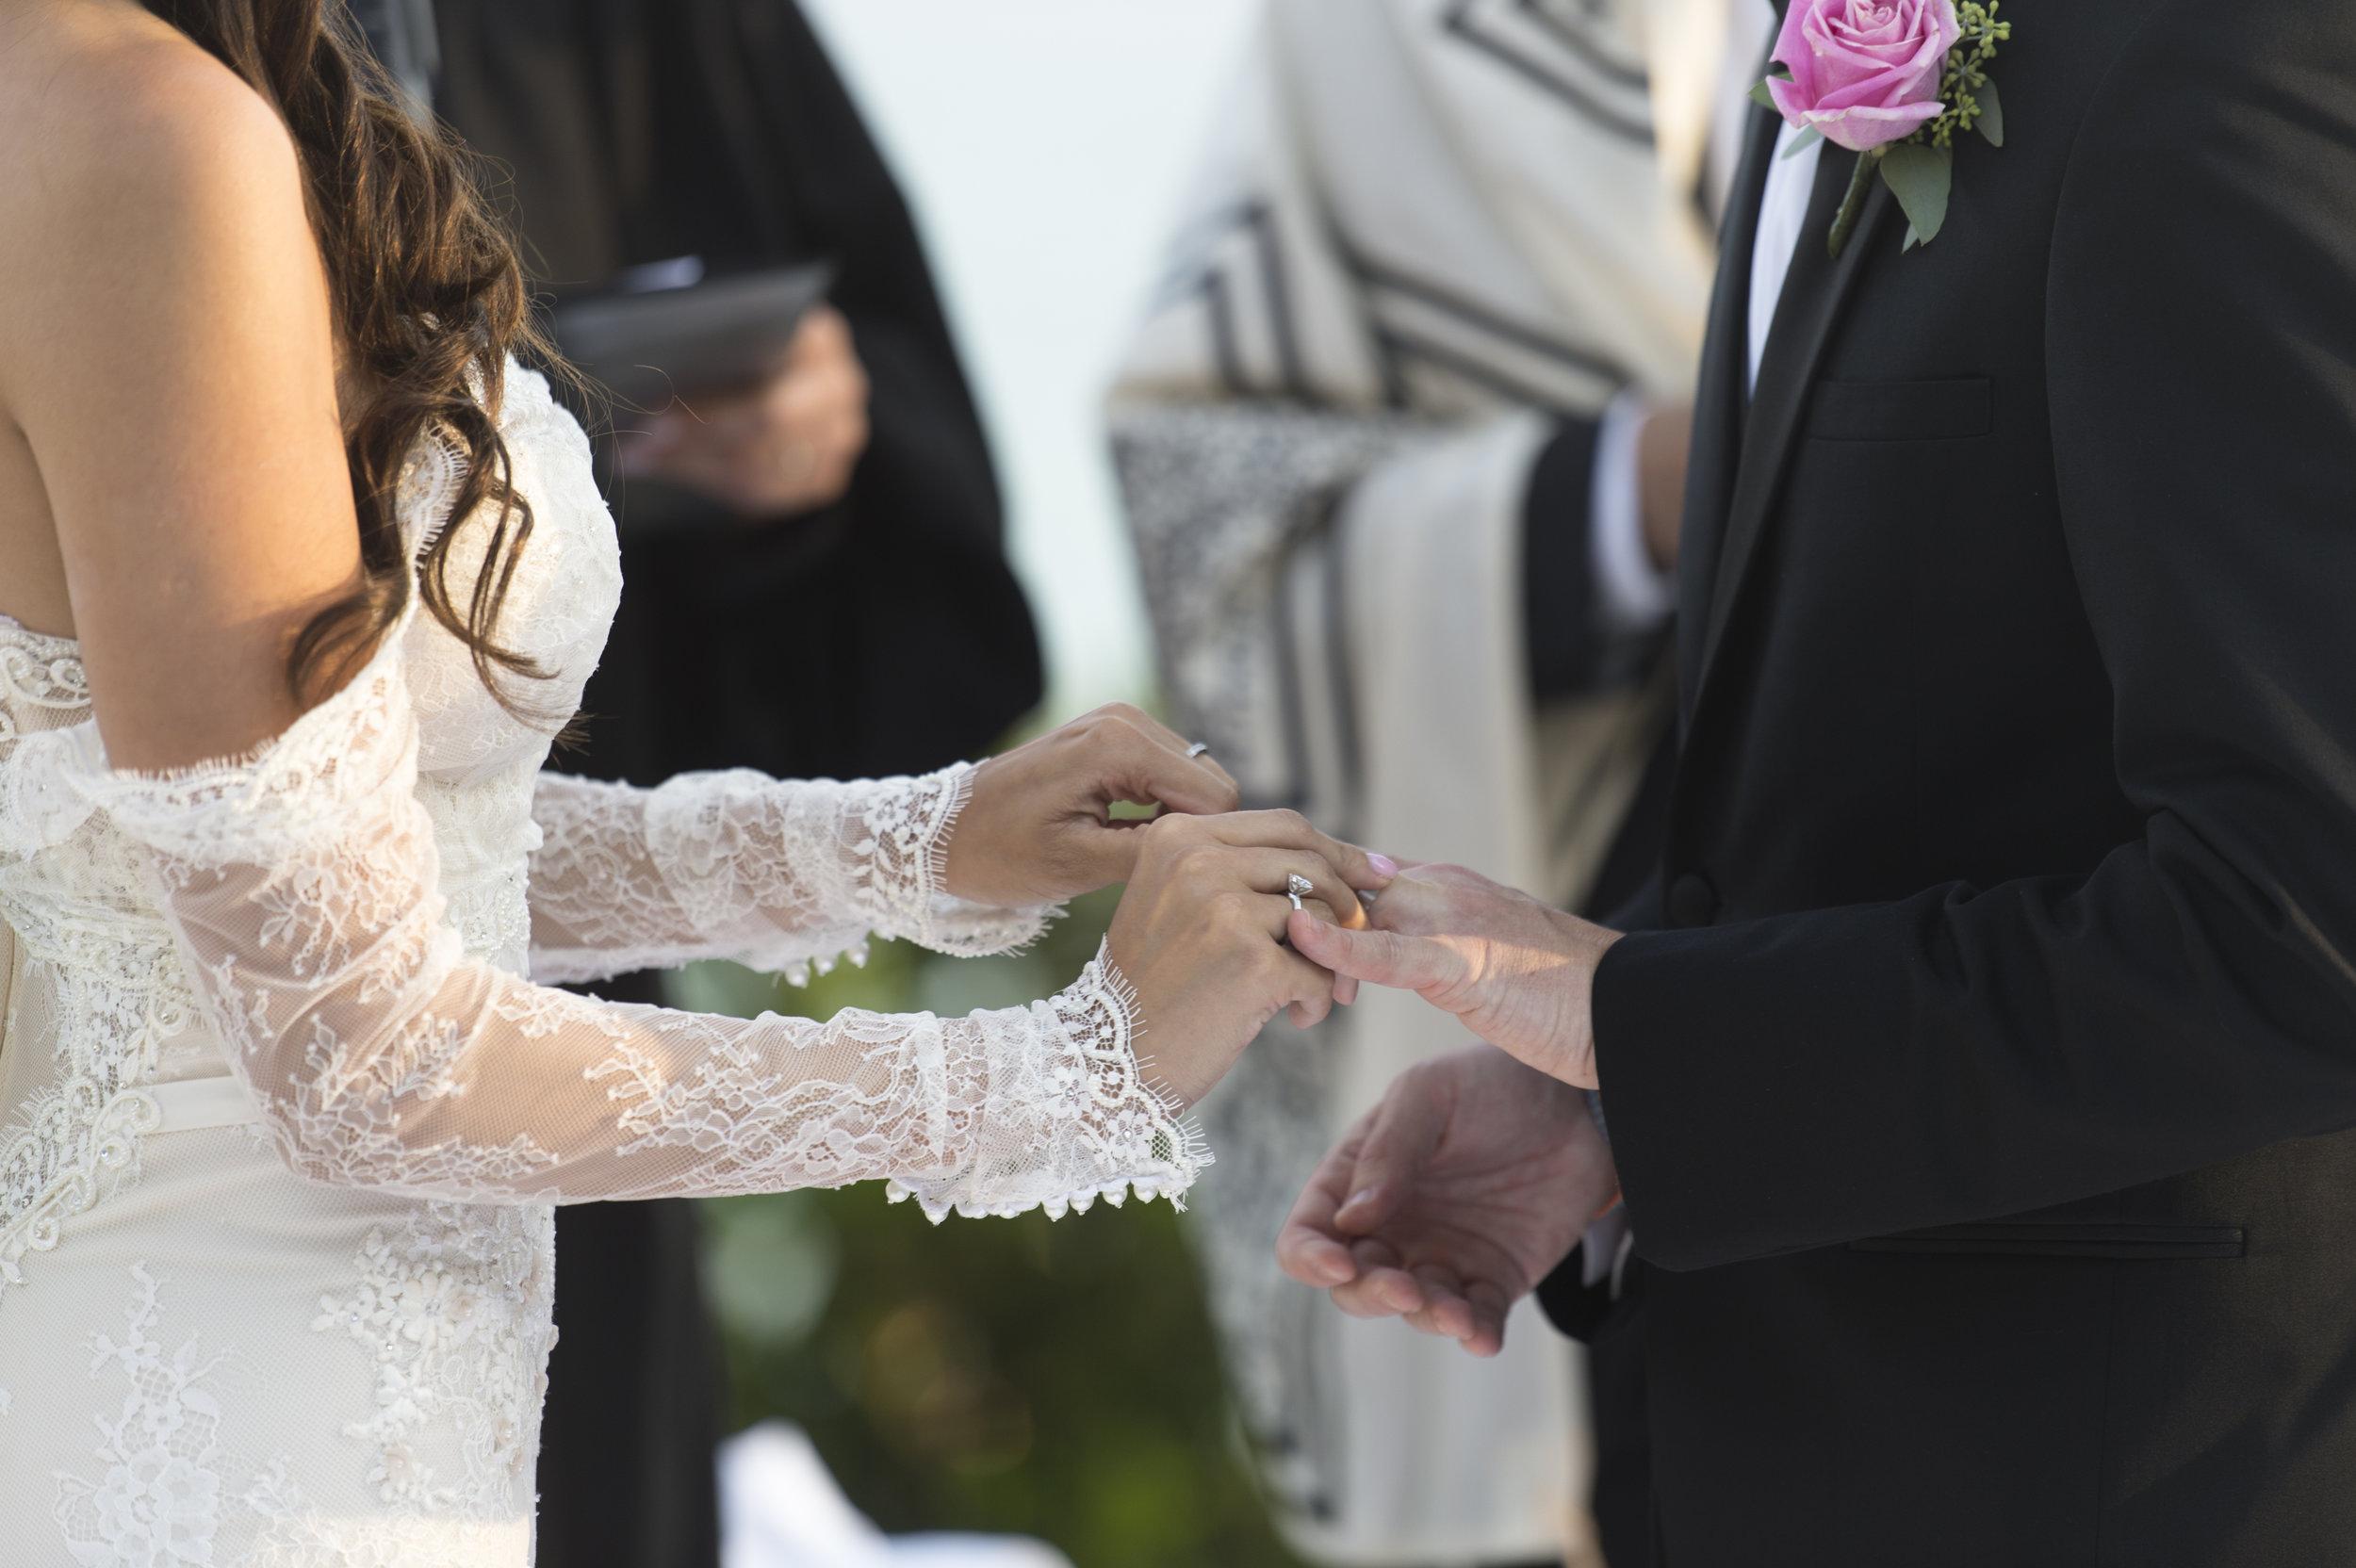 Lone Sleeve Wedding Dress 0 A Romantic Bel Air Bay Club Ocean-View Wedding - Southern California Wedding - Kevin Dinh Photography